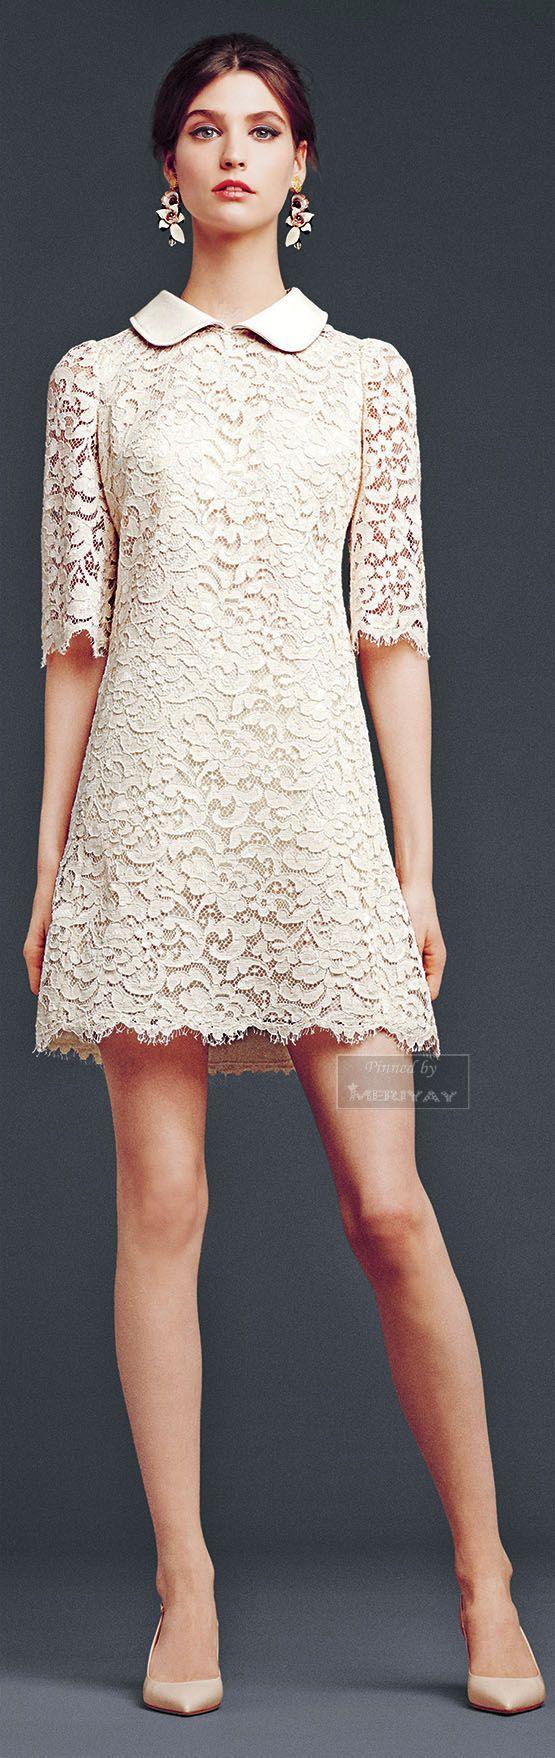 I <3 this dress! Dolce & Gabbana Fall Winter 2014 2015.